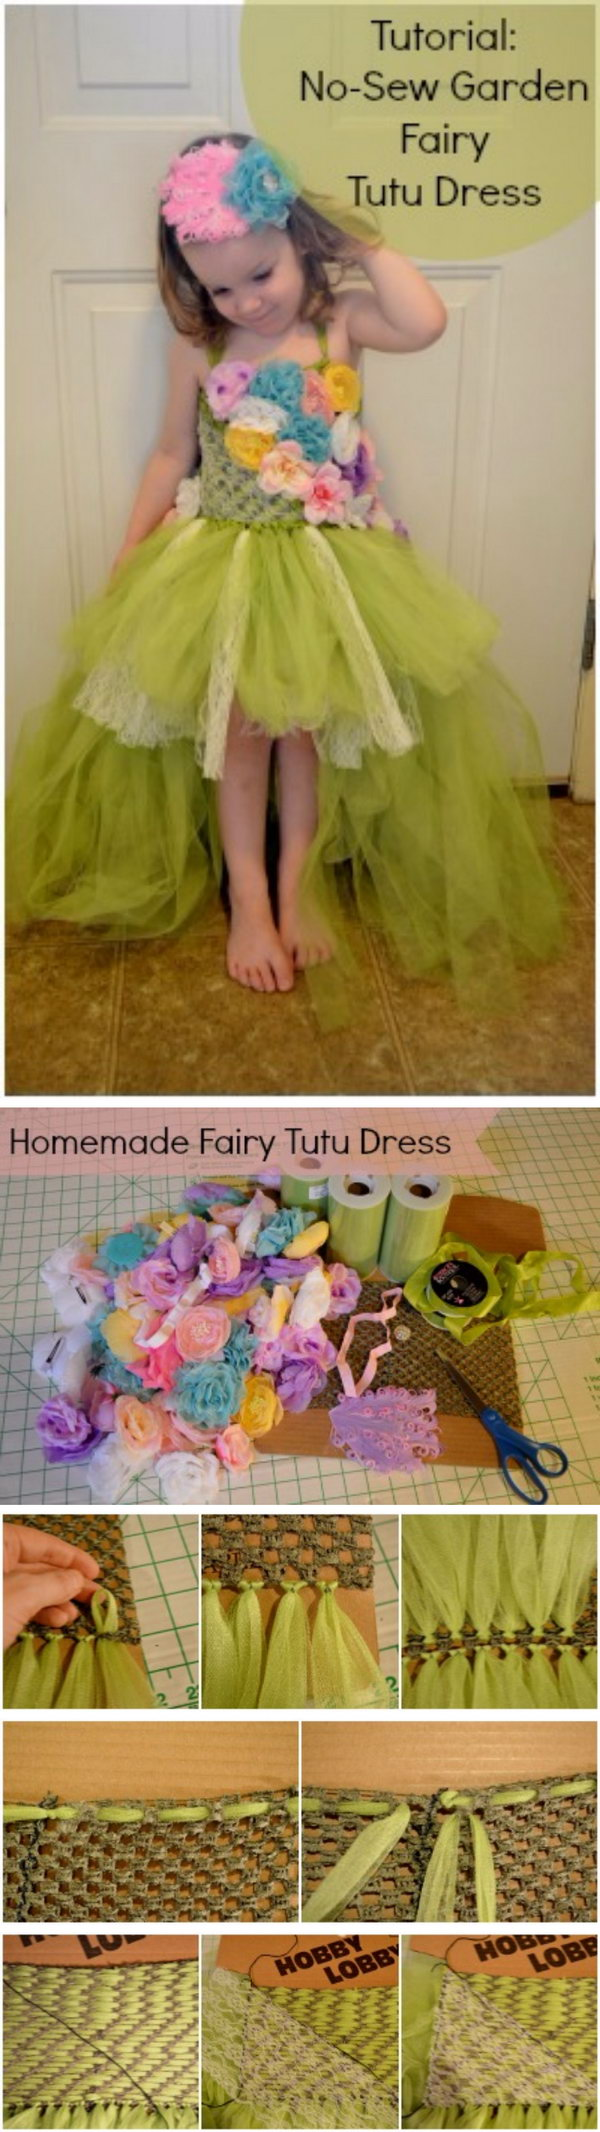 No-Sew Fairy Tutu Dress